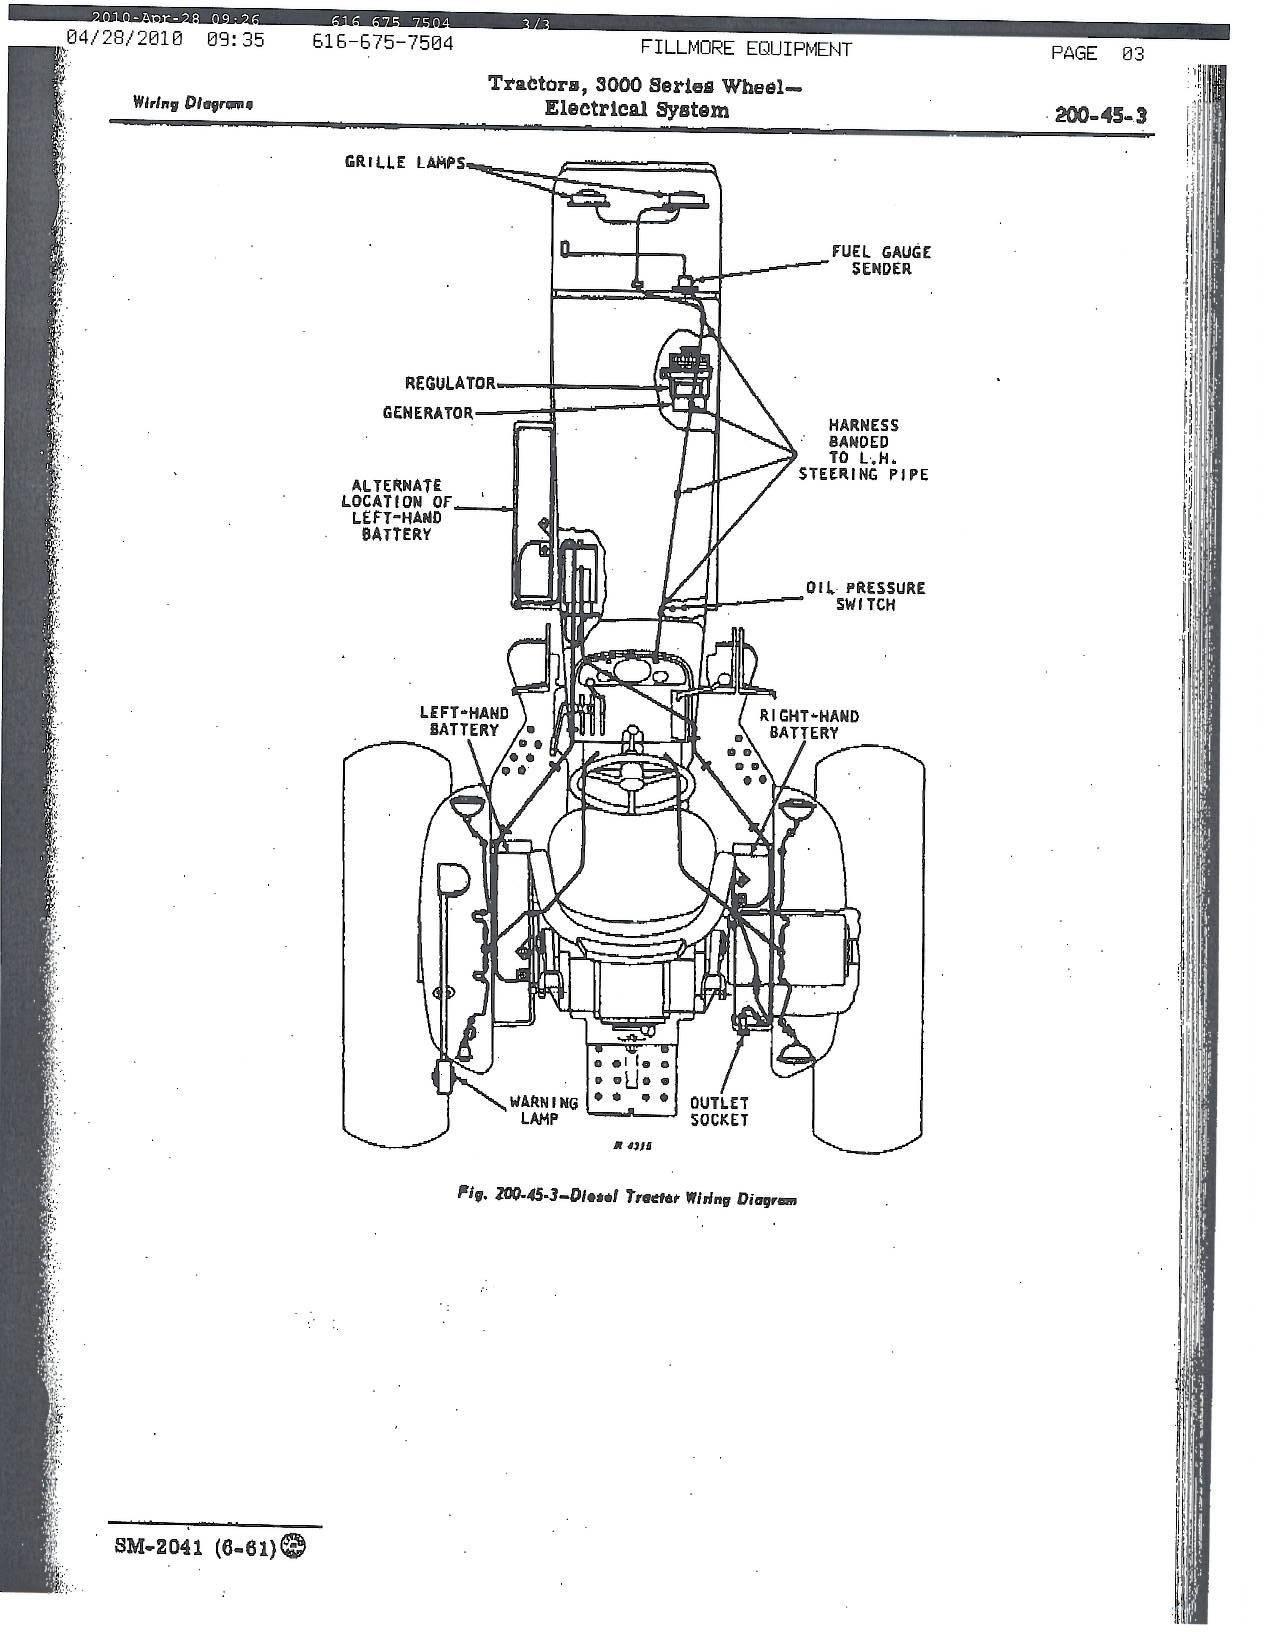 John Deere 1010 Wiring Diagram Library. John Deere Zero Turn Mower Wiring Diagram Explained Diagrams 4430 Wiringdiagram. John Deere. John Deere 1010 Pto Diagram At Scoala.co